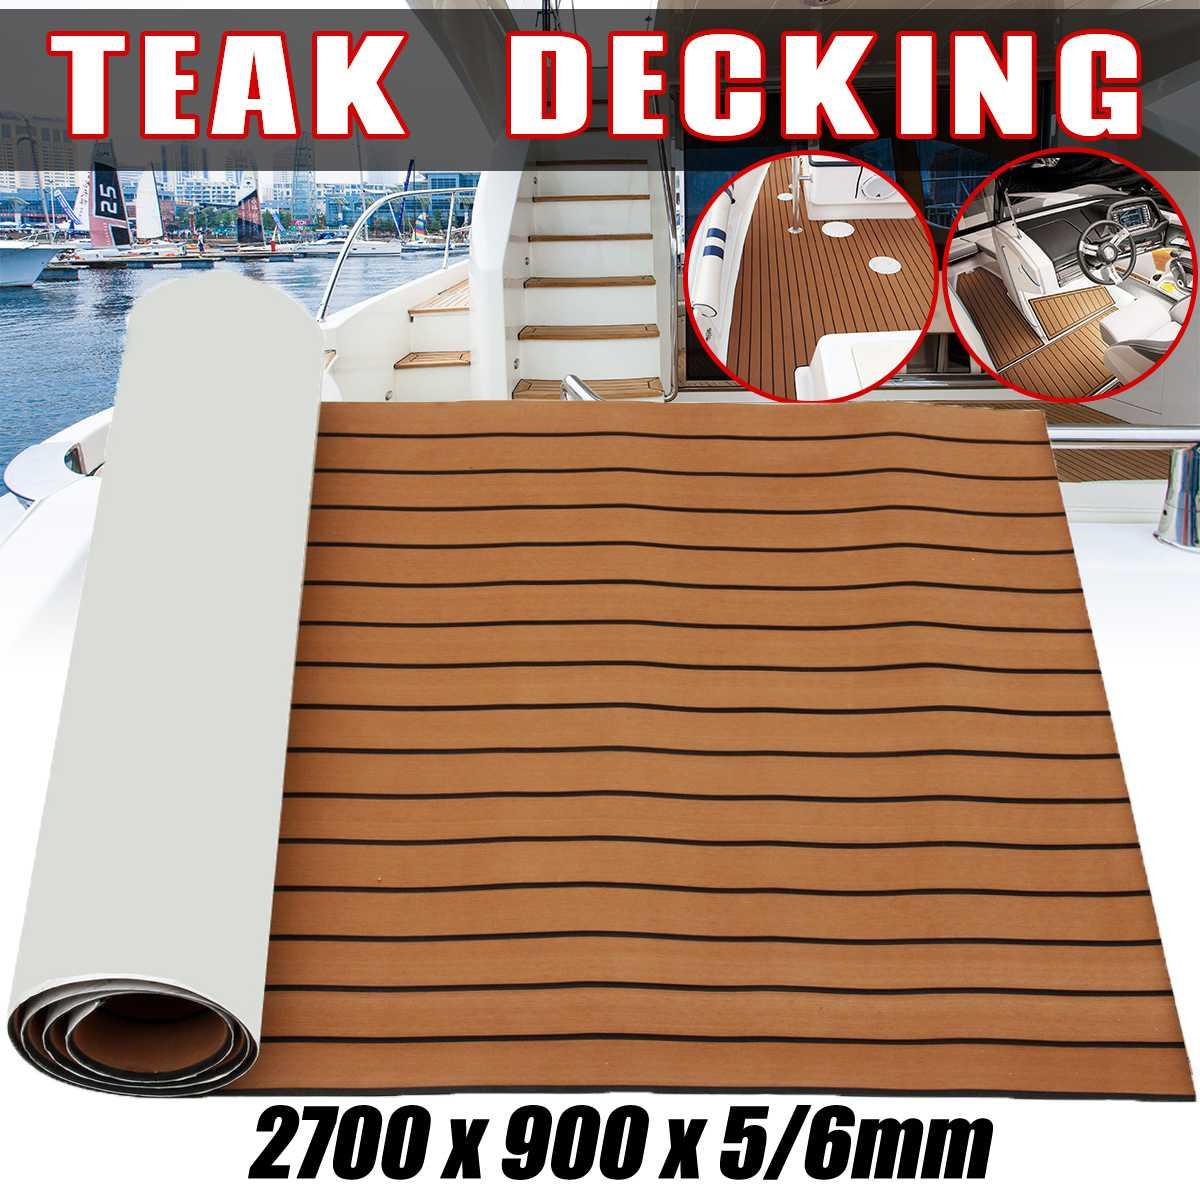 Self-Adhesive 900x2700x5/6mm EVA Foam Faux Teak Decking Sheet Dark Brown Marine Boat DIY Protective Floor CarpetSelf-Adhesive 900x2700x5/6mm EVA Foam Faux Teak Decking Sheet Dark Brown Marine Boat DIY Protective Floor Carpet